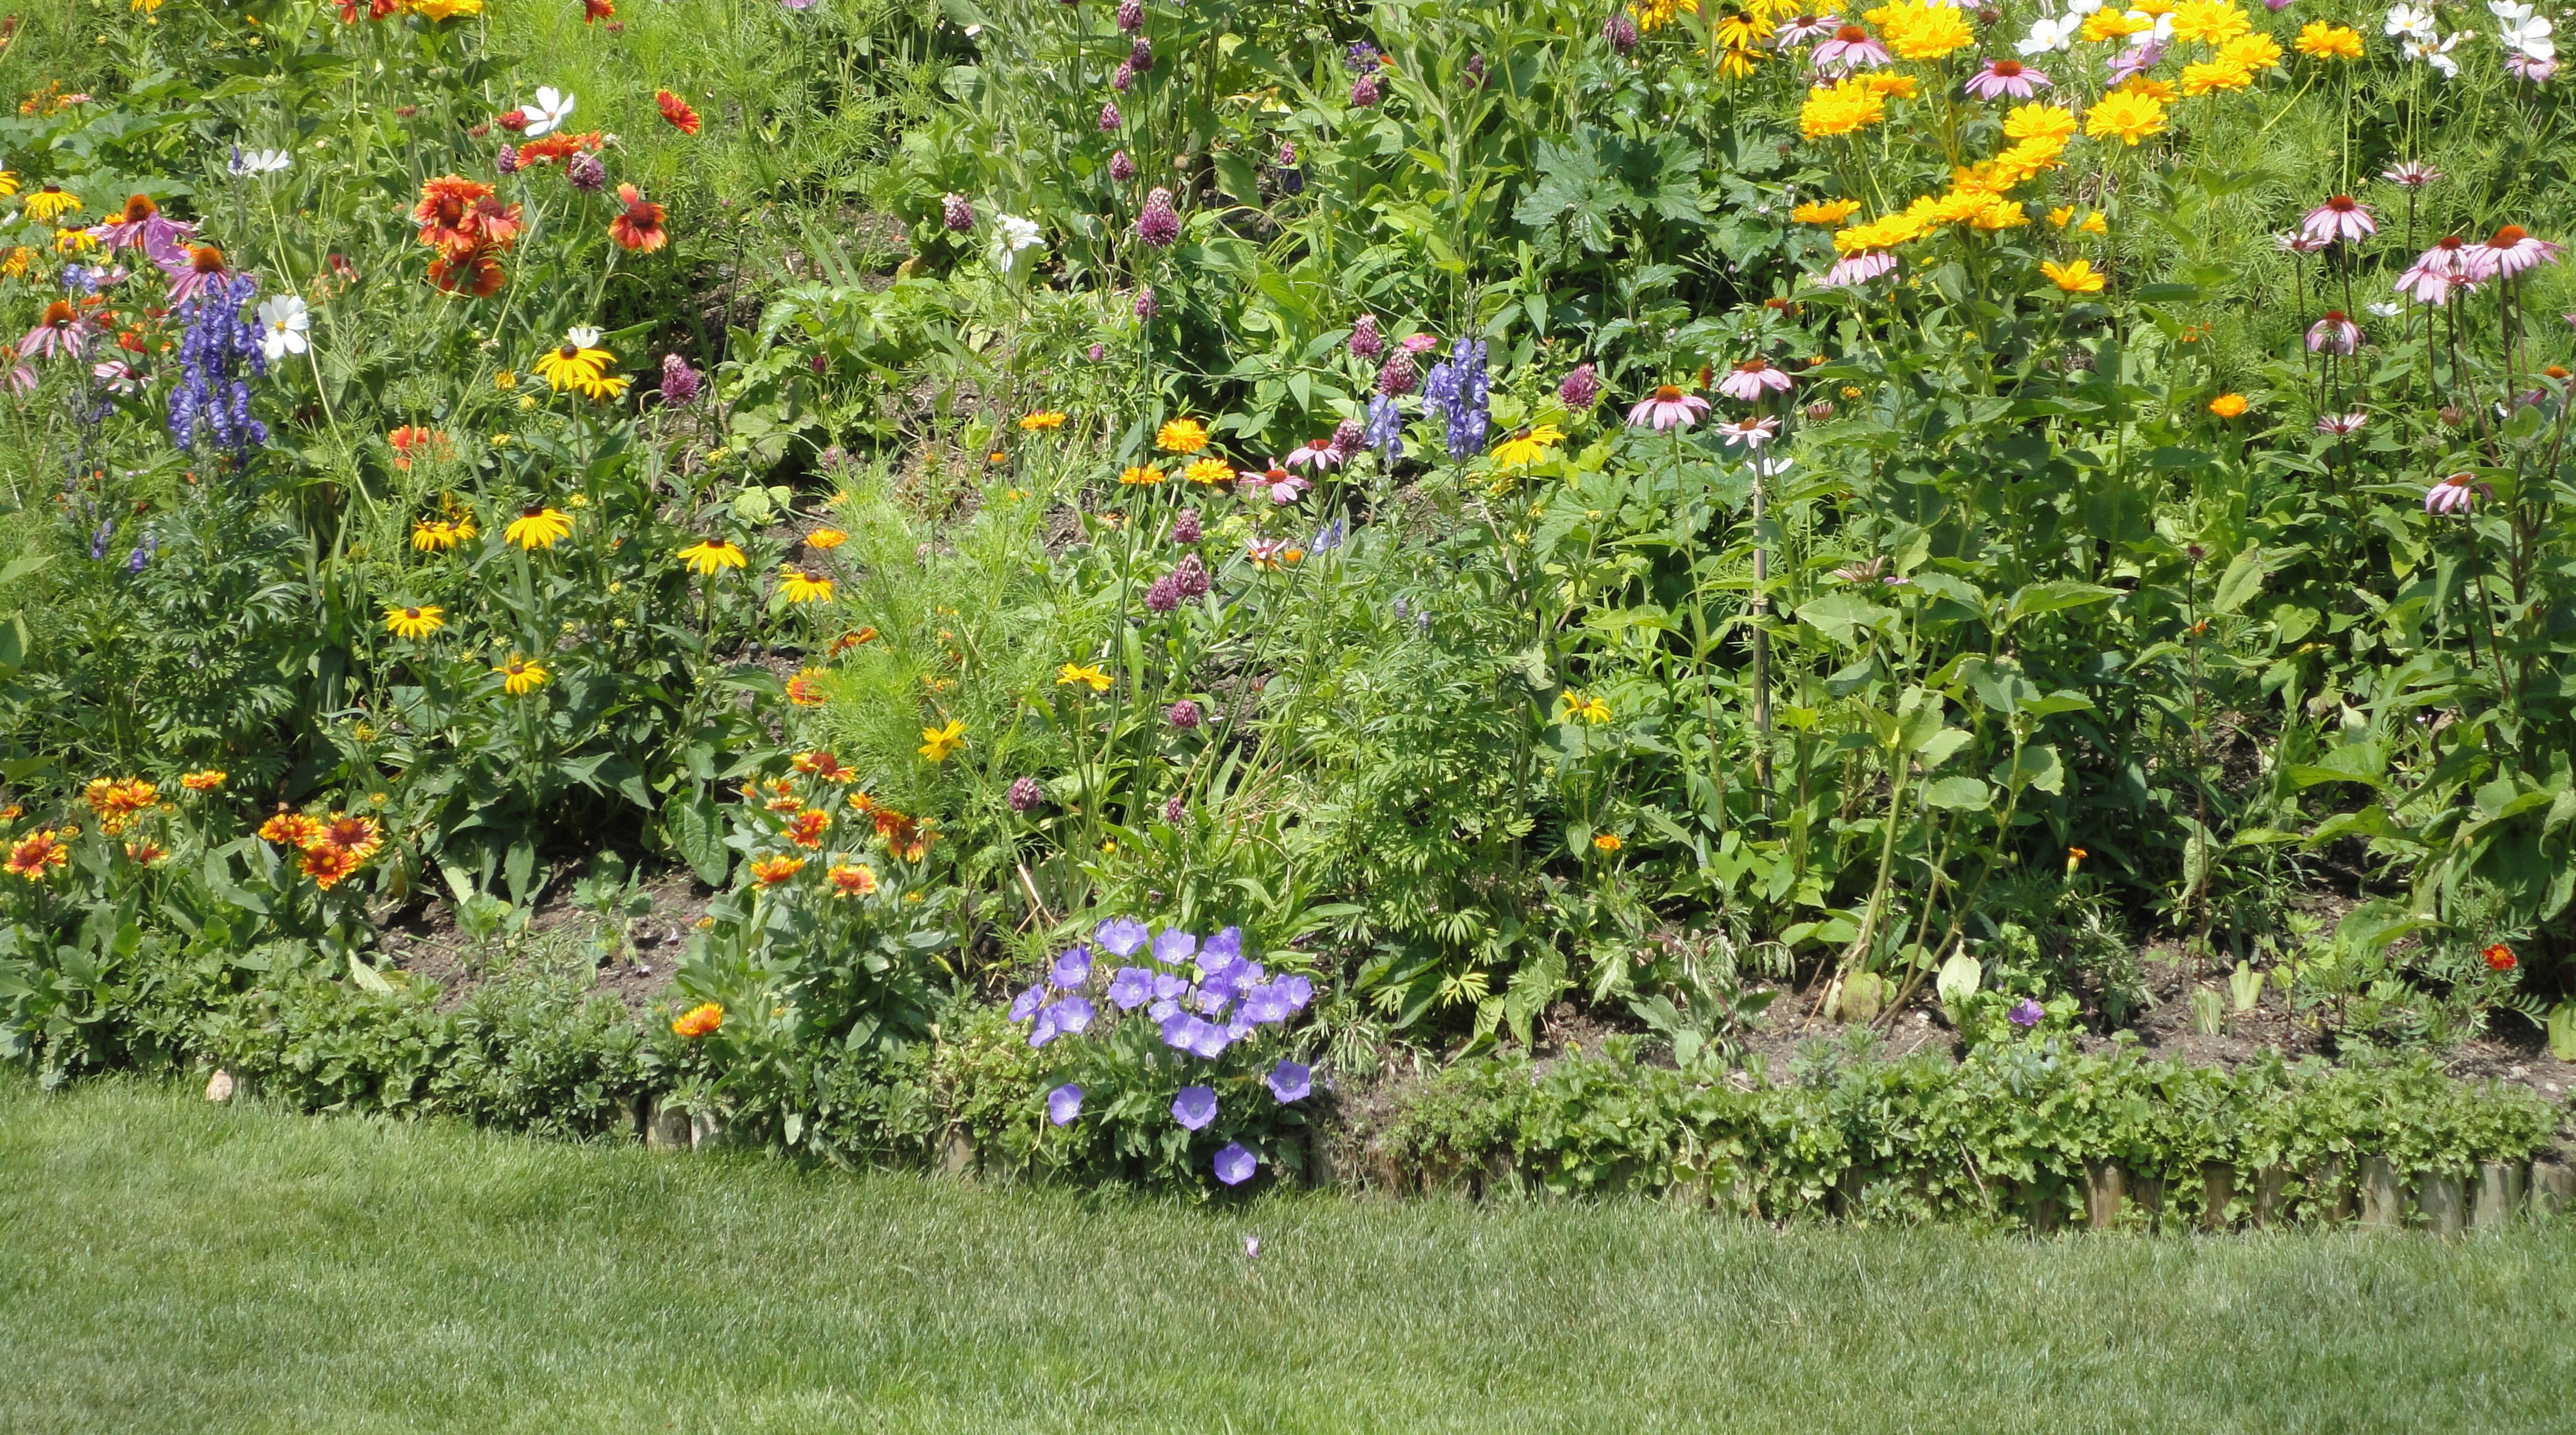 Terrassenhang Mit Sommerblumen Terrassenhang Mit Sommerblumen Terrassenhang  Mit Sommerblumen [1427293711897376]